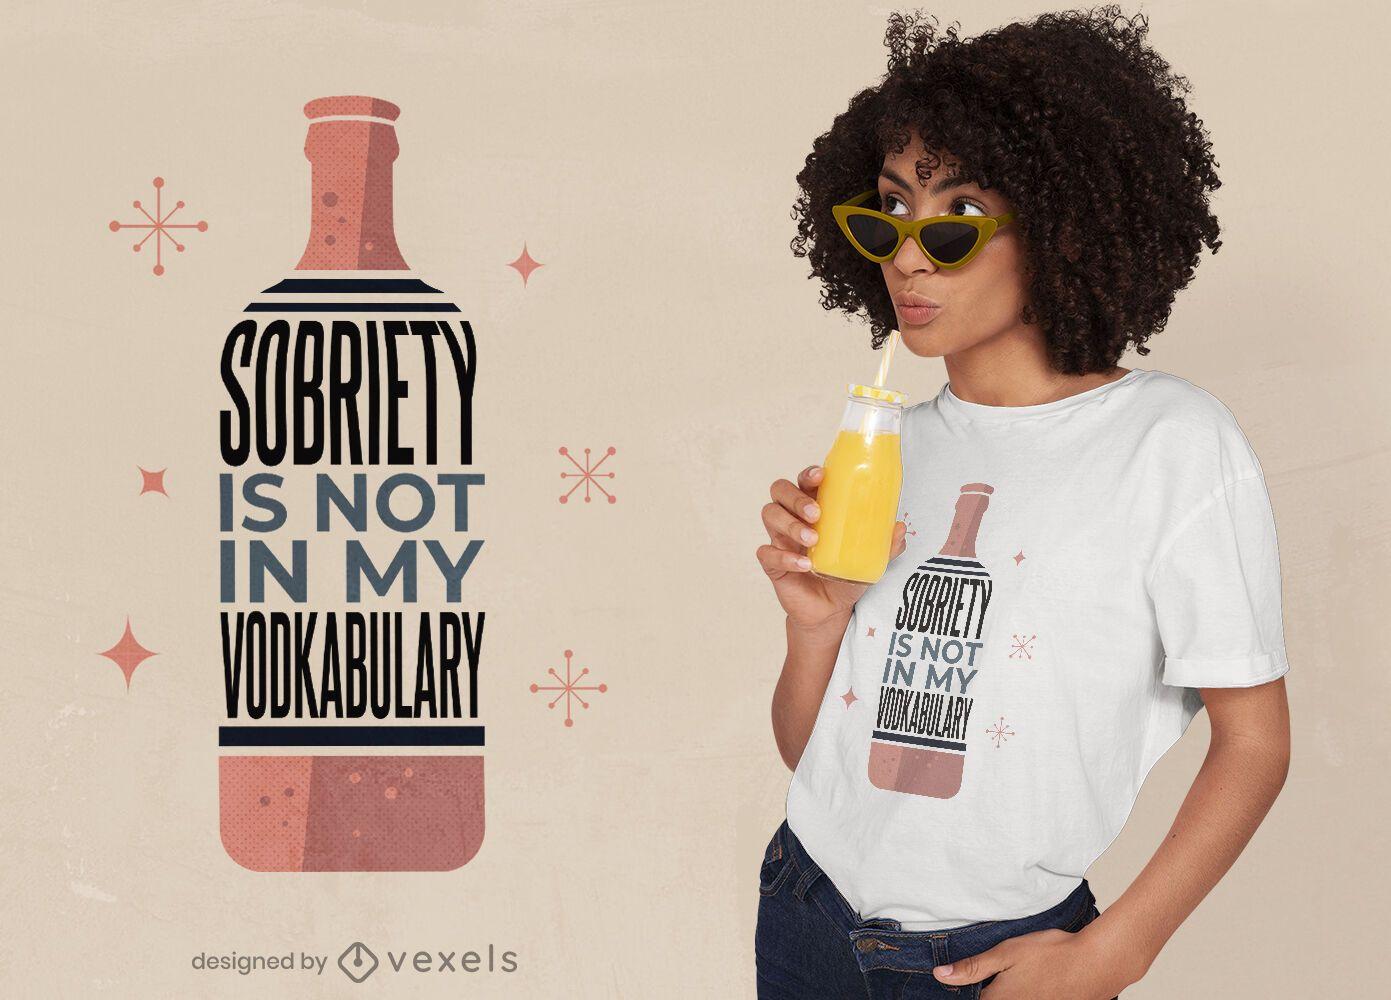 Vodkabulary t-shirt design